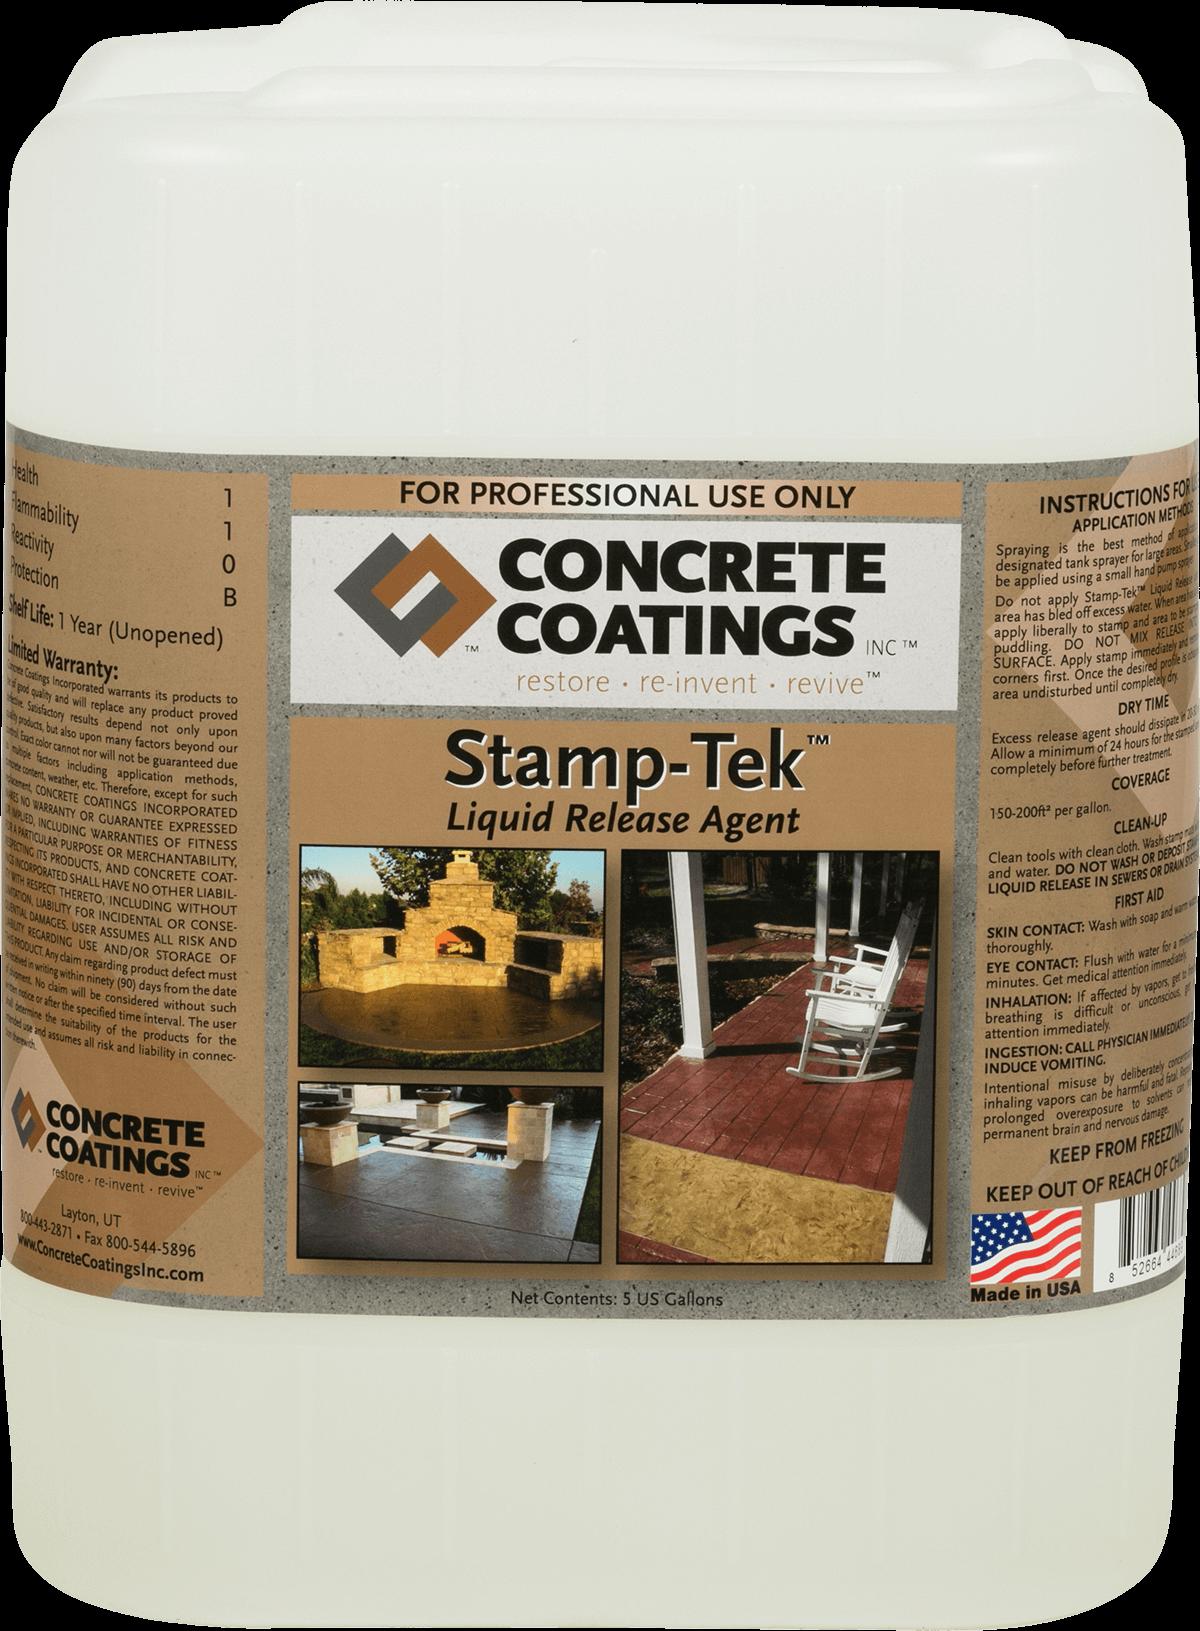 Stamp-Tek™ Liquid Release